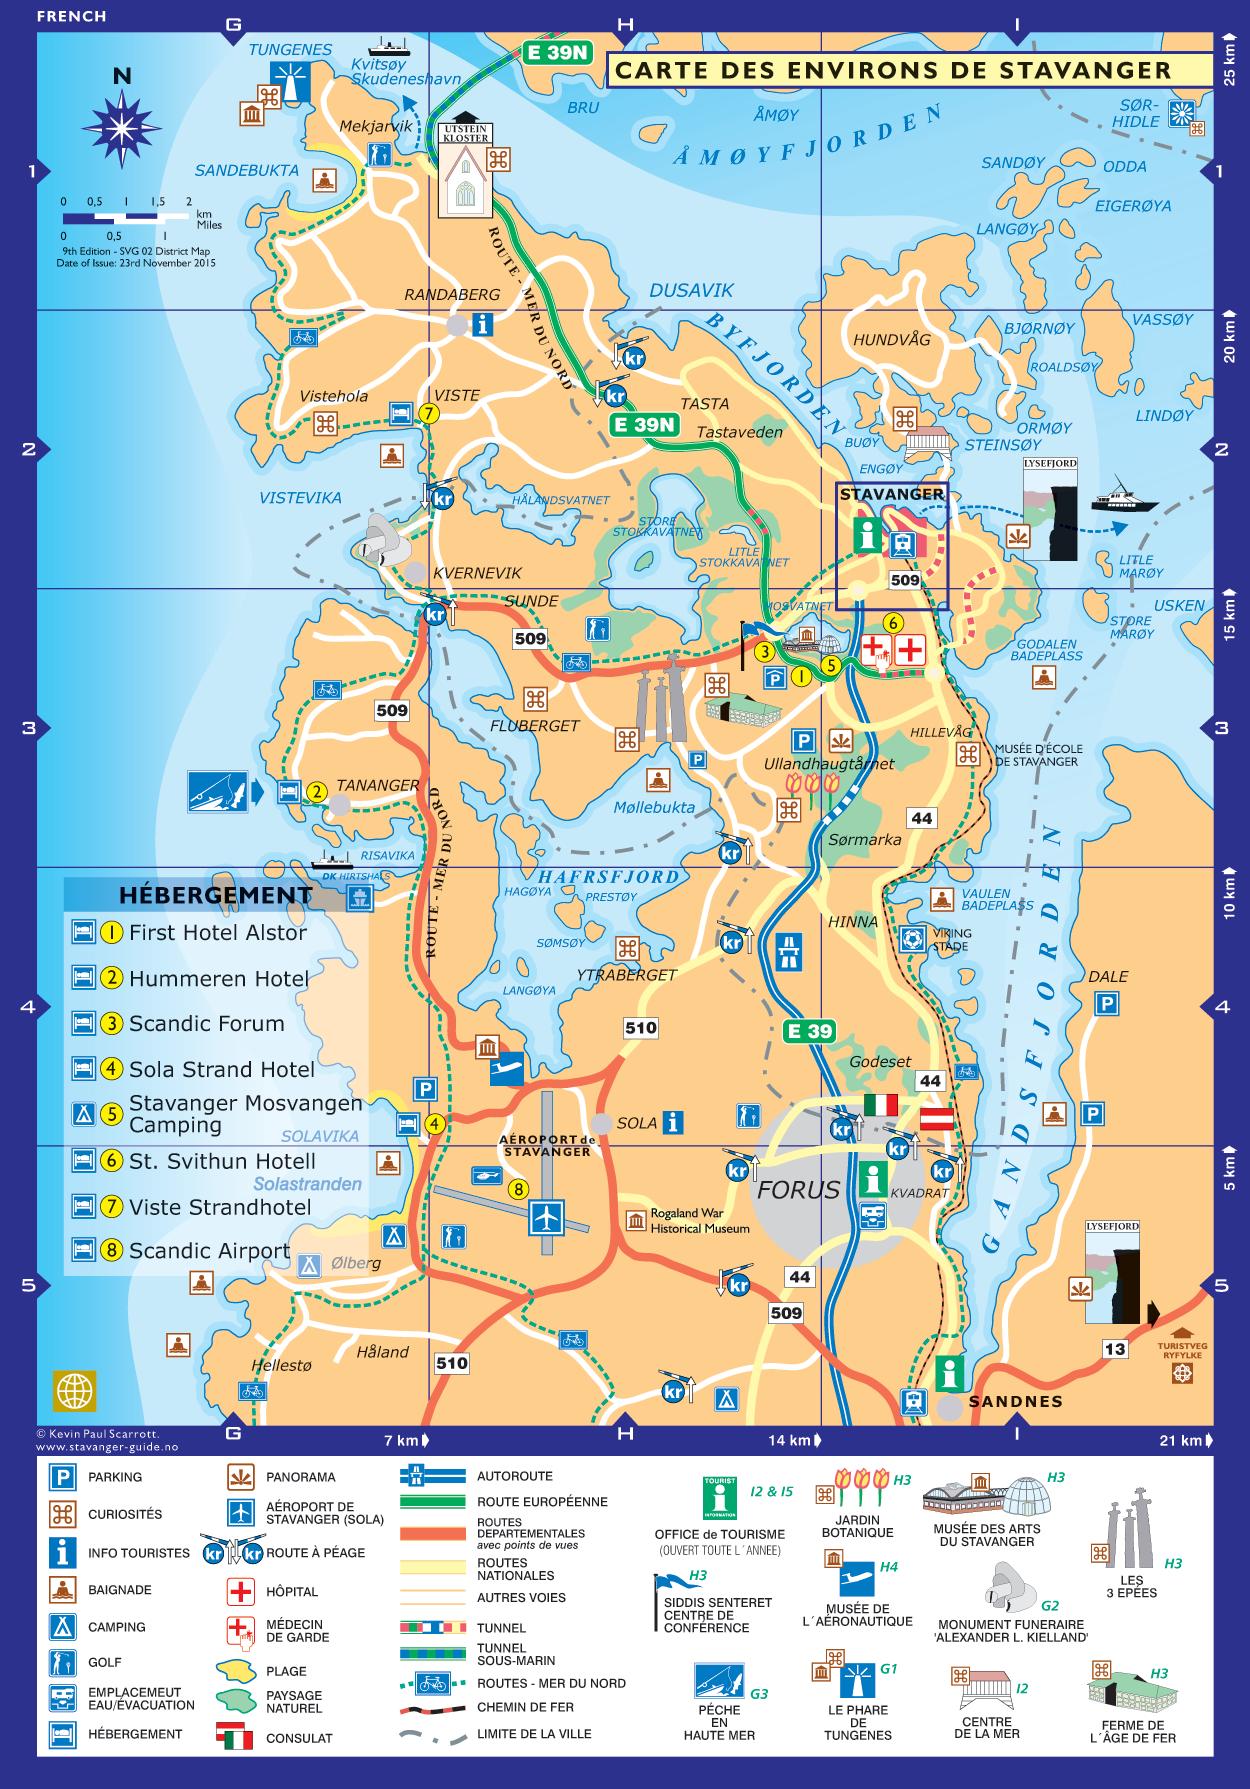 Carte des environs de Stavanger